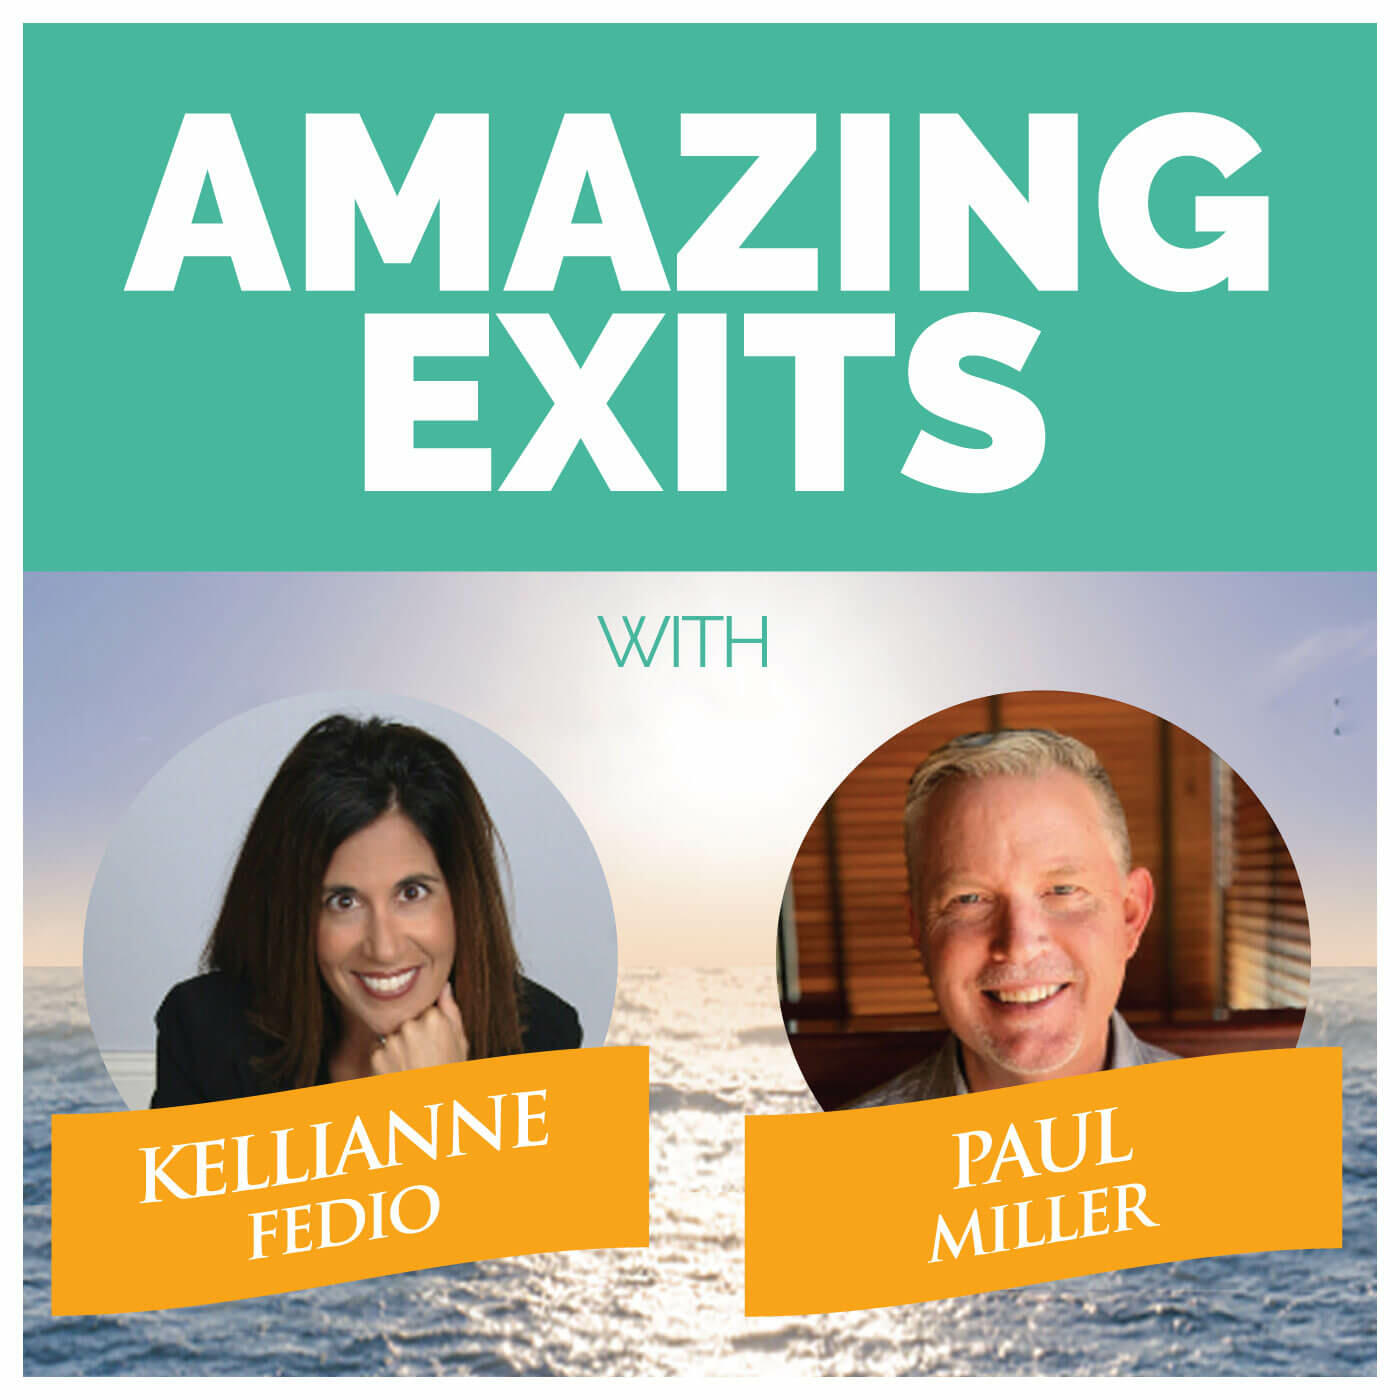 Amazing Exits Podcast